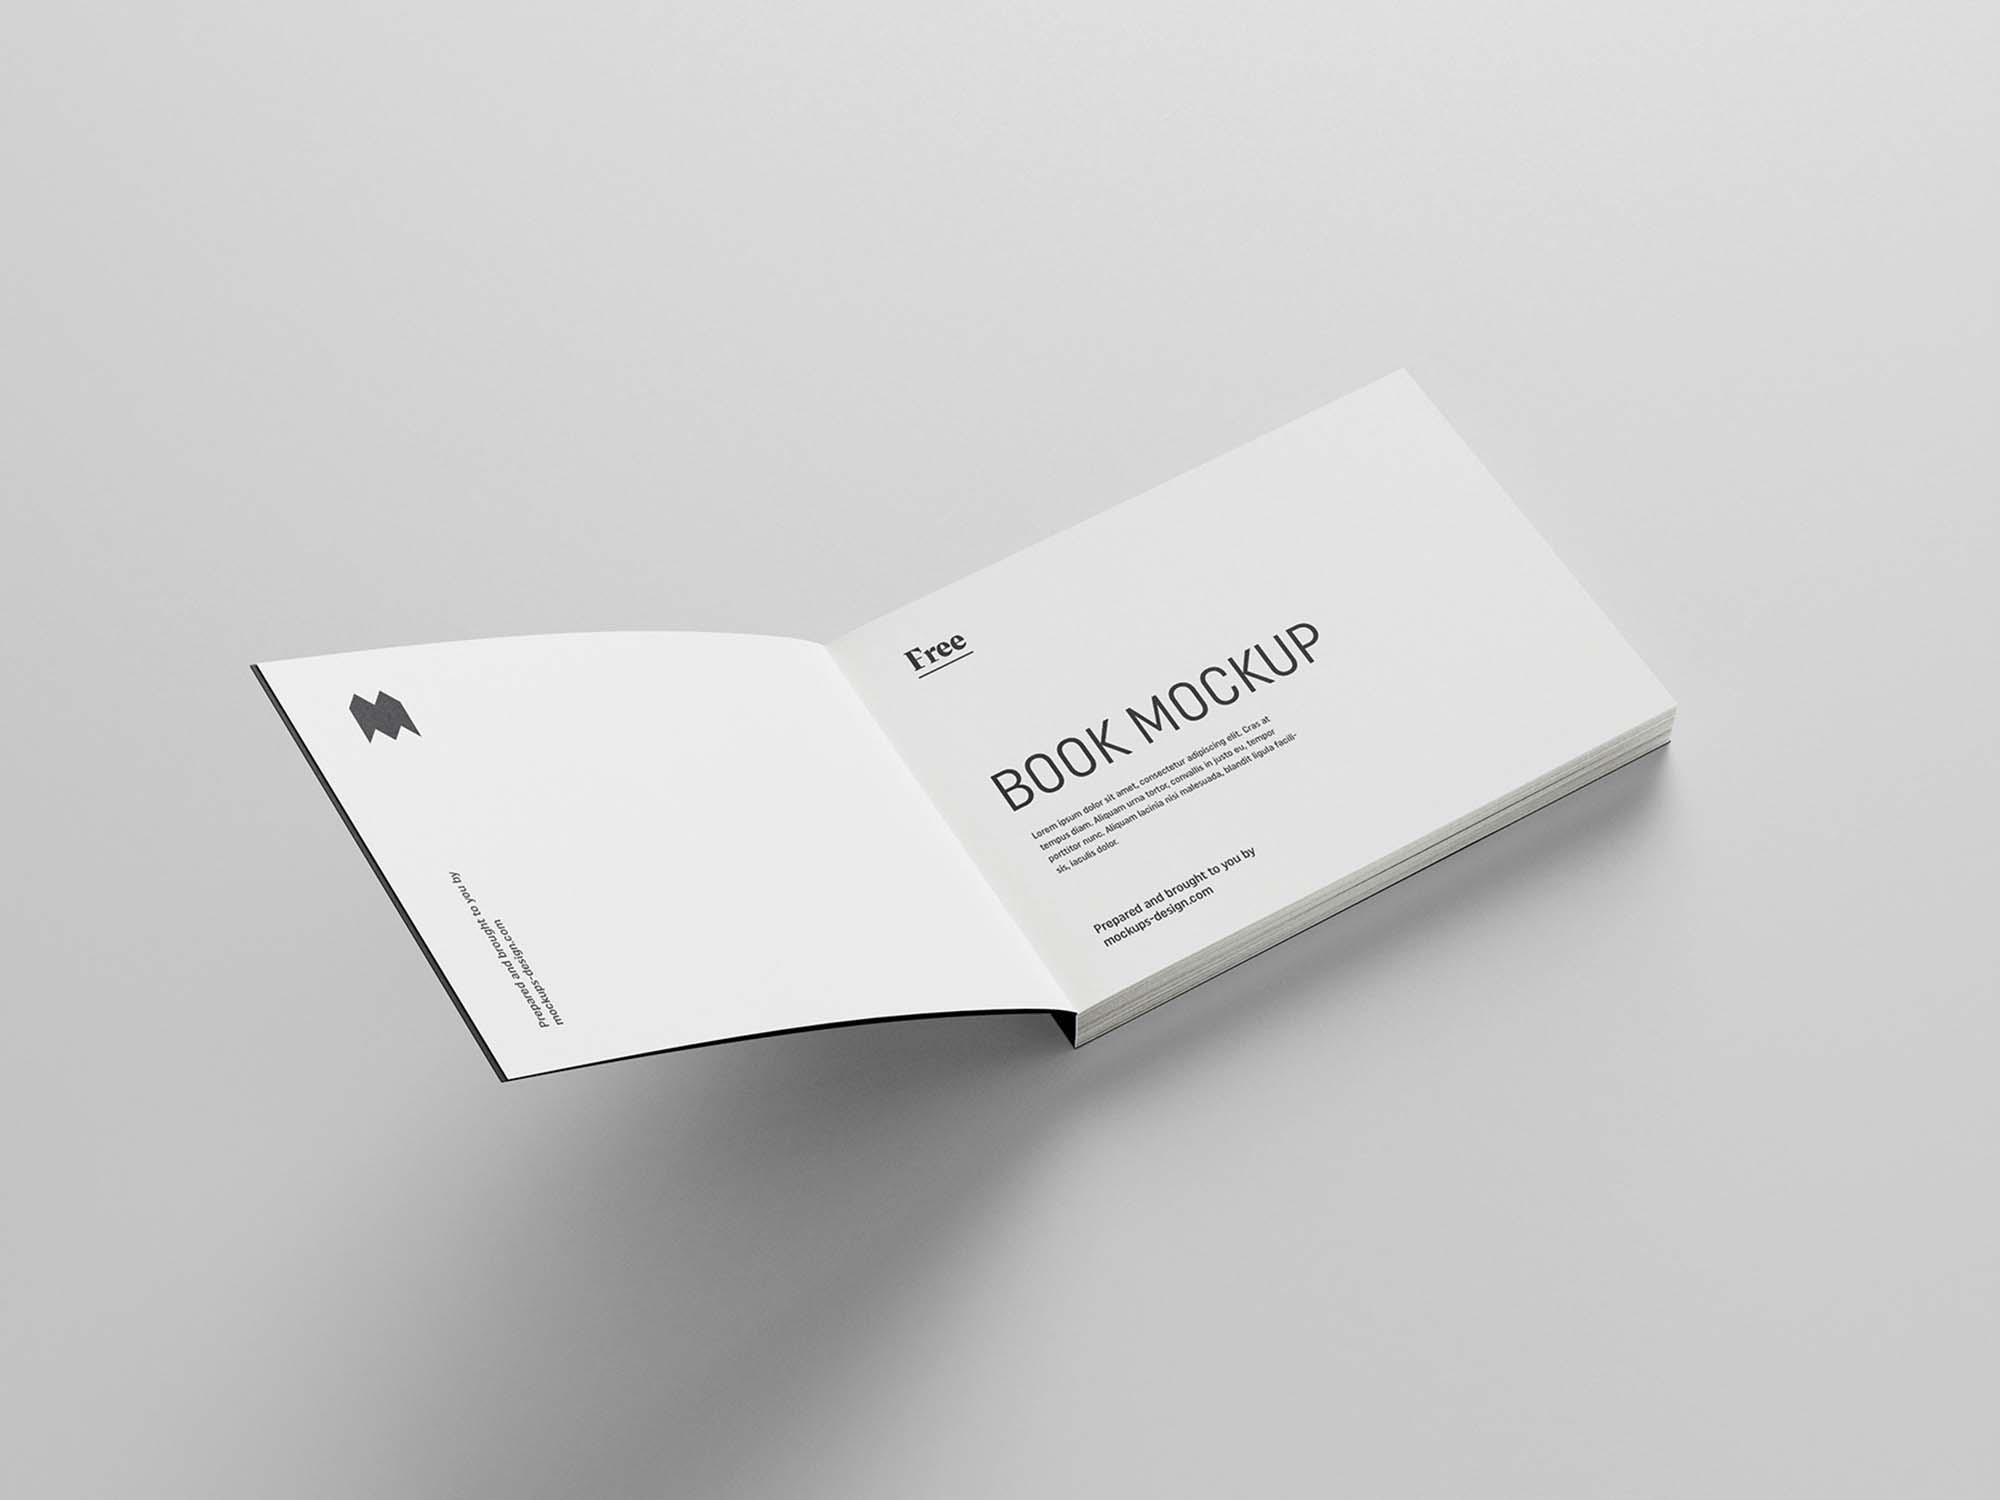 Landscape Softcover Book Mockup 4